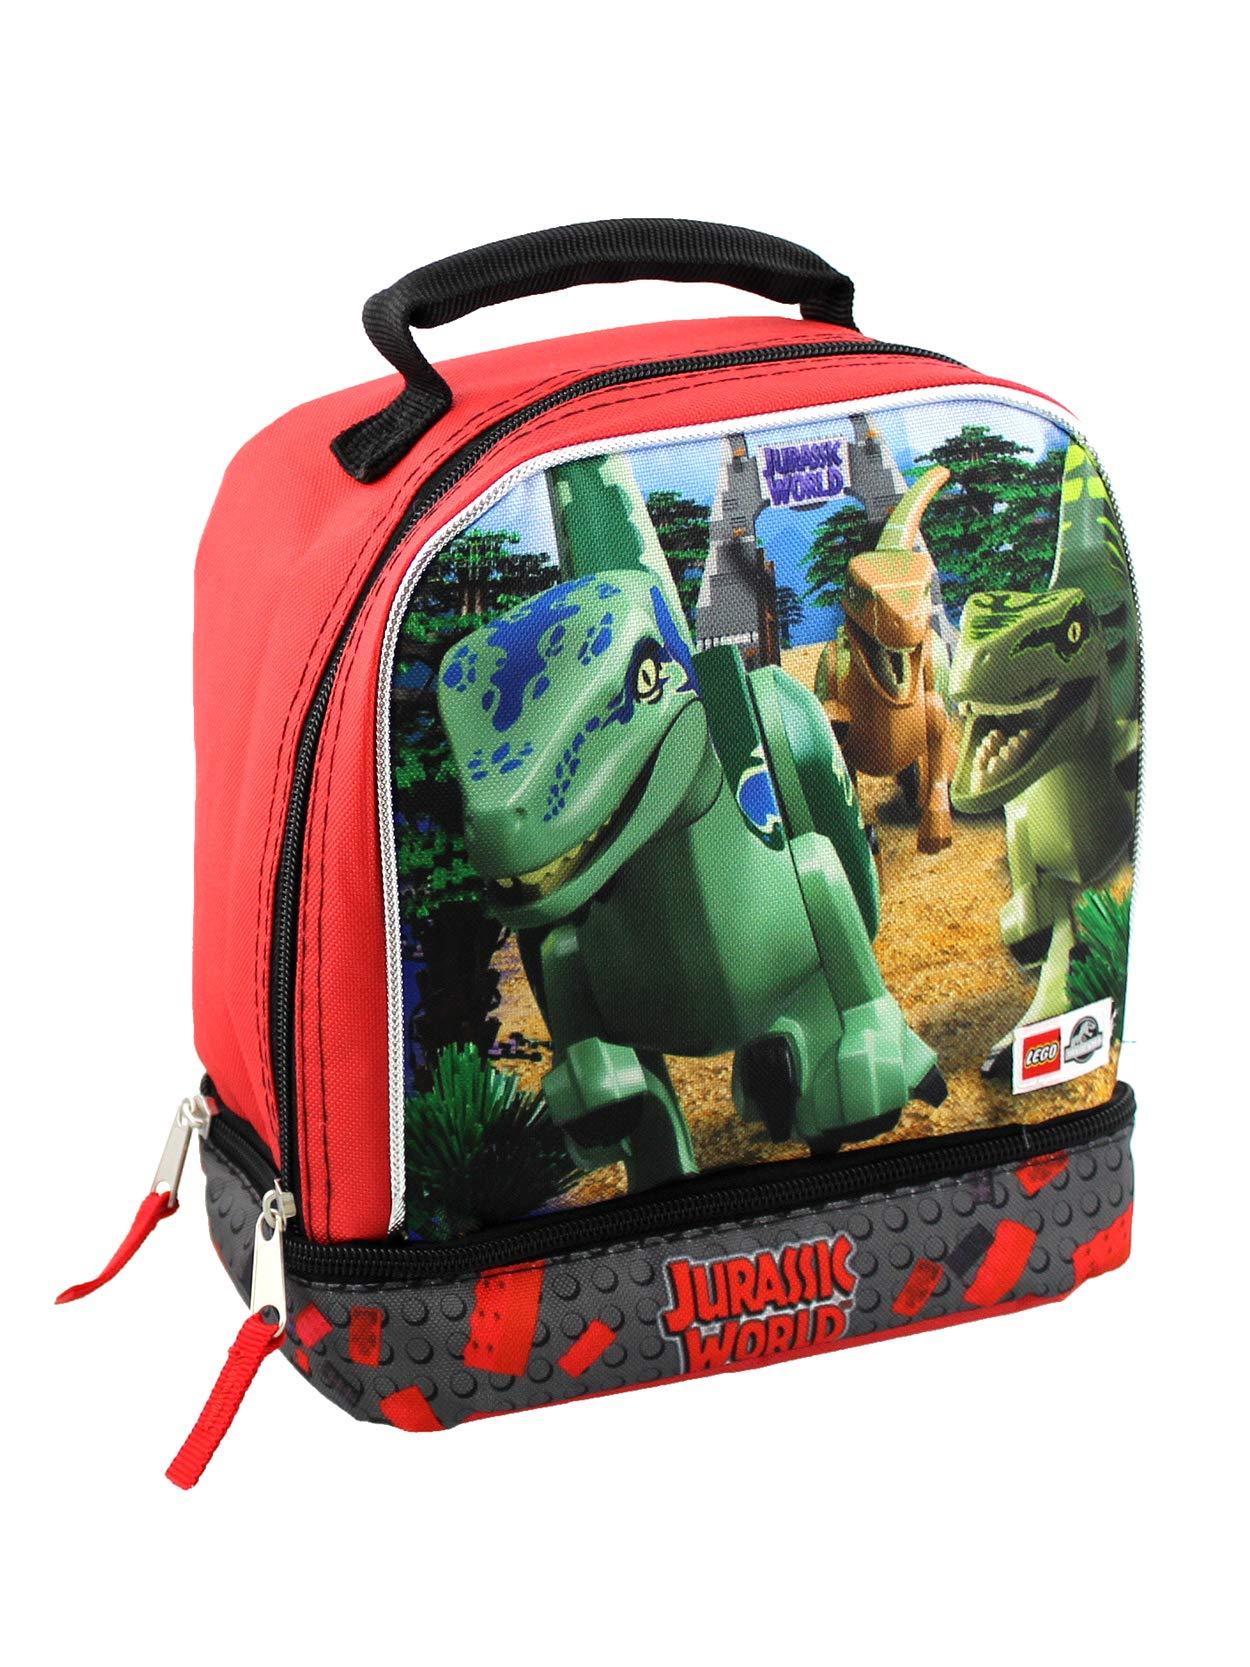 Jurassic World Compartment Insulated School